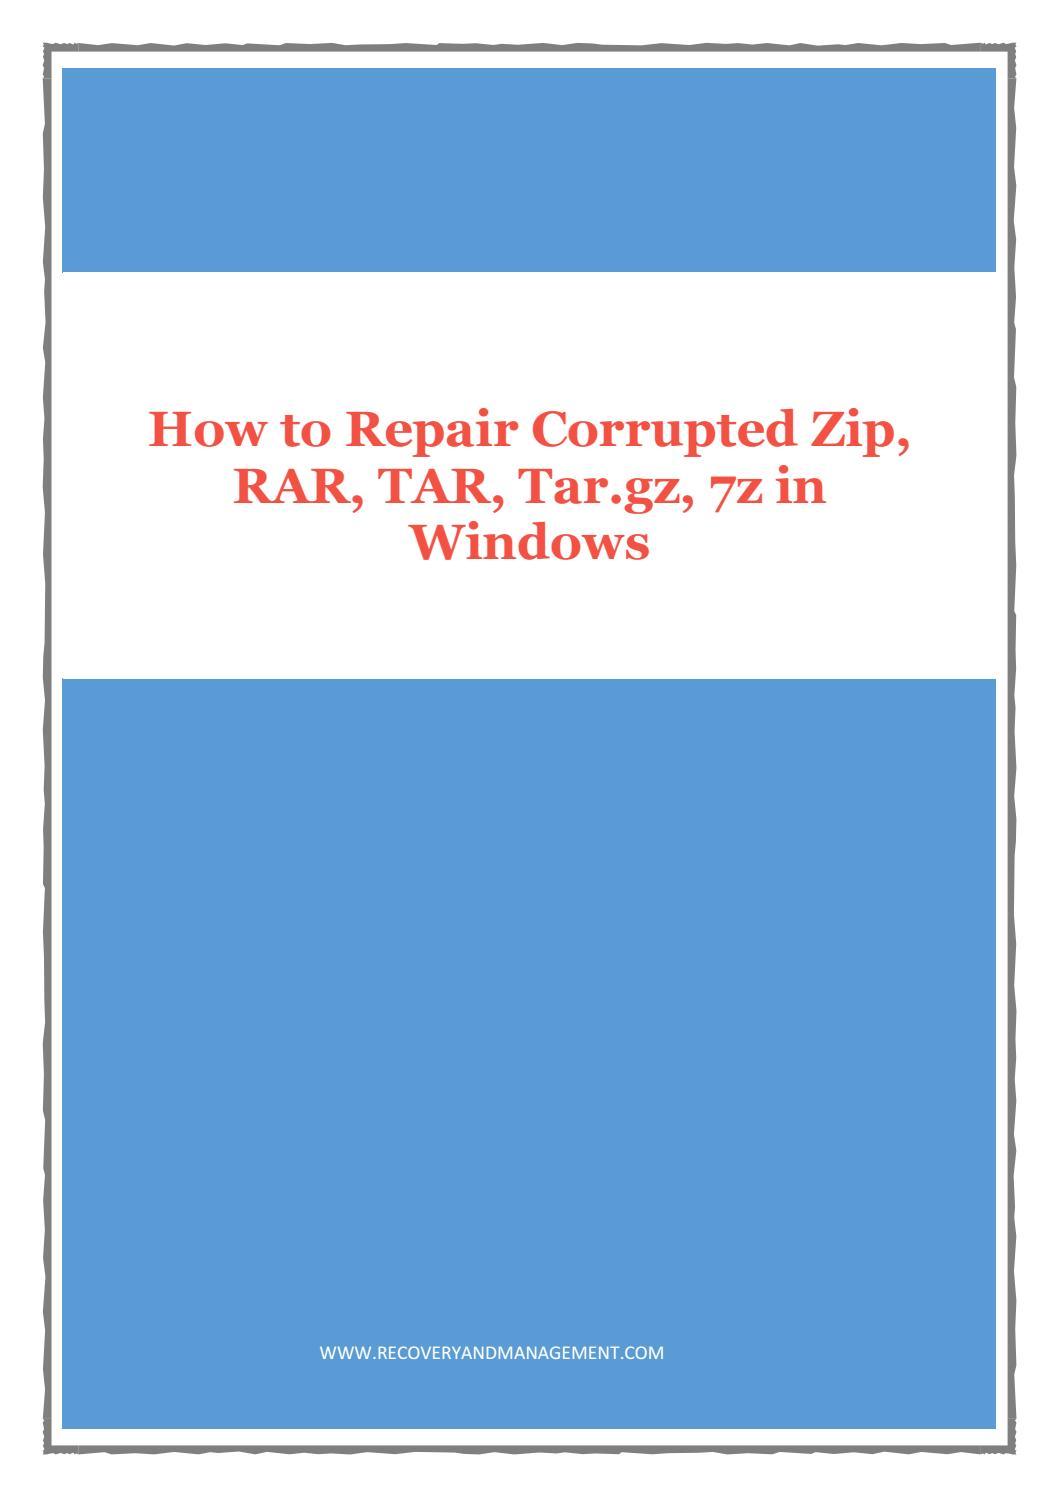 Archive Recovery Software: Zip, Rar, Tar, 7z, Tar gz, etc